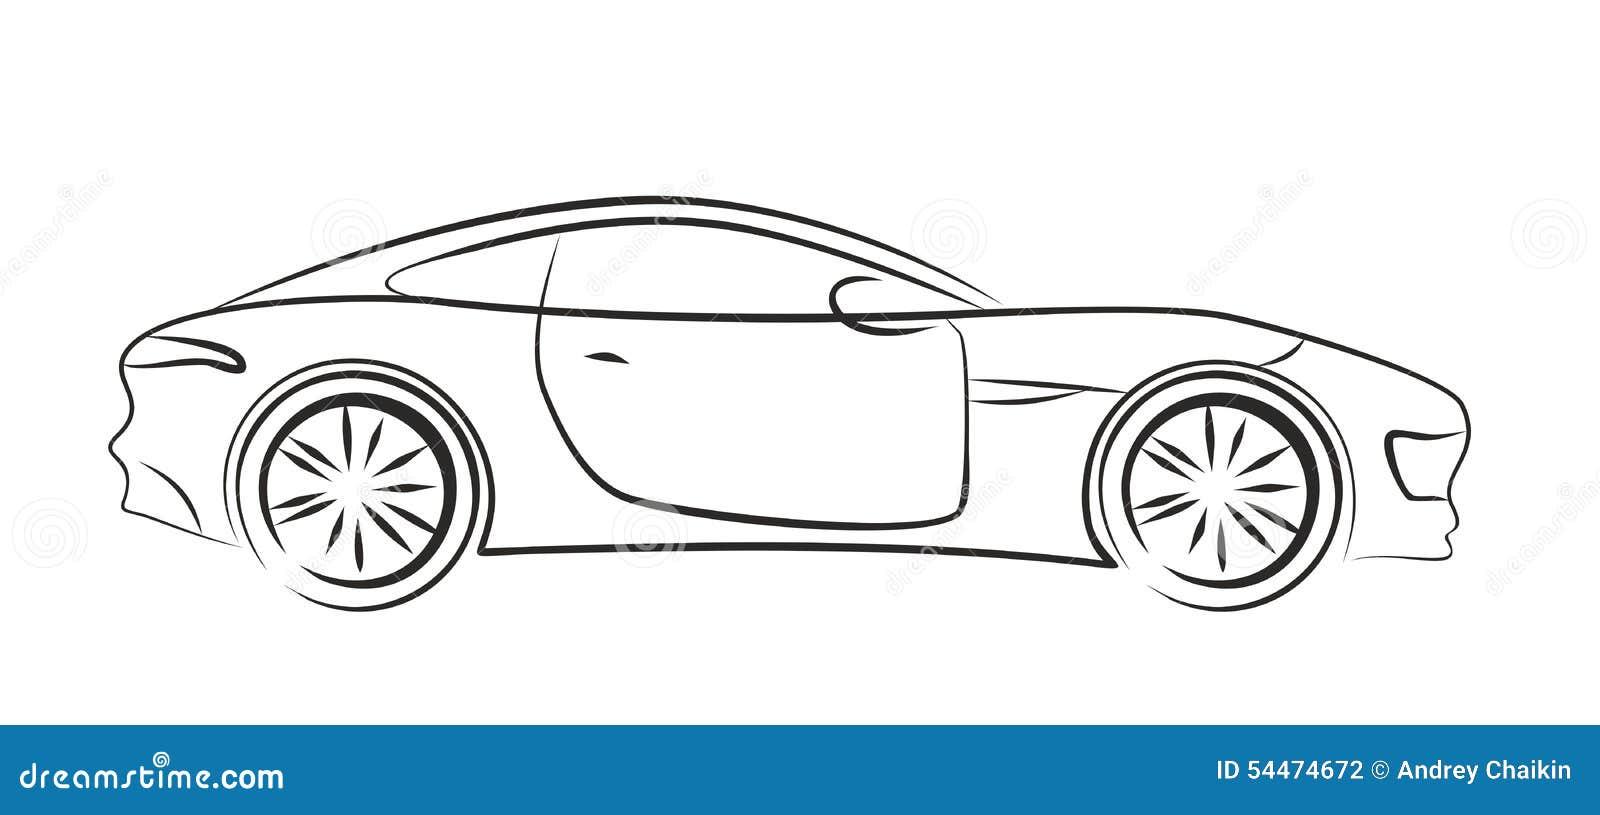 Car Logo. Stock Vector. Illustration Of Sports Race - 54474672